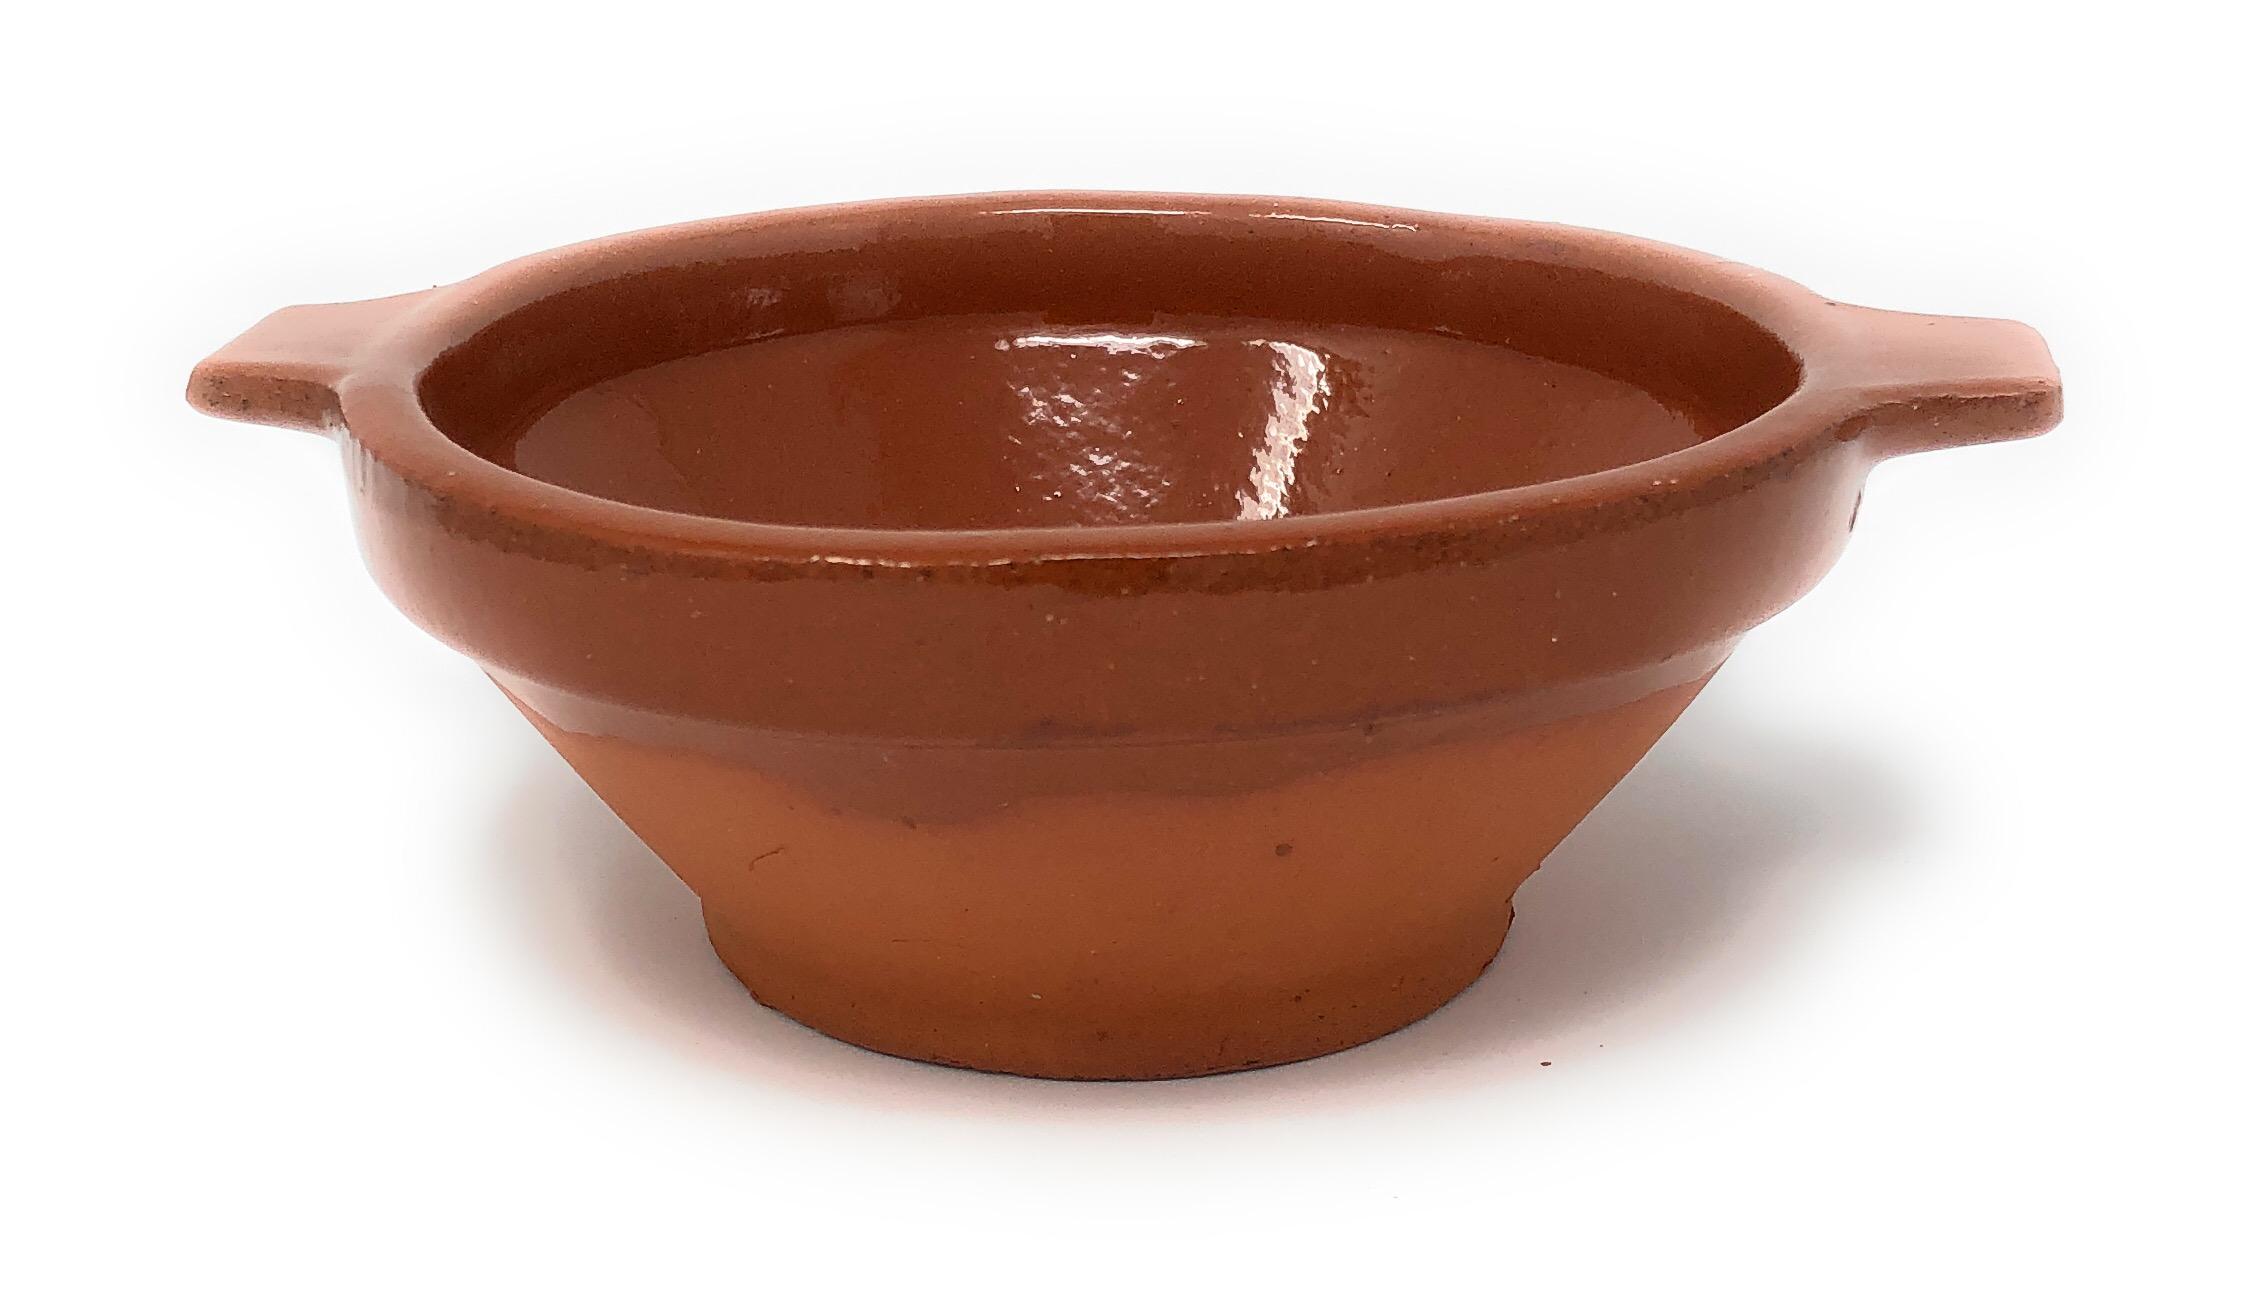 Alfareria Padilla Cazuela Keramik Suppenschale 15x7cm